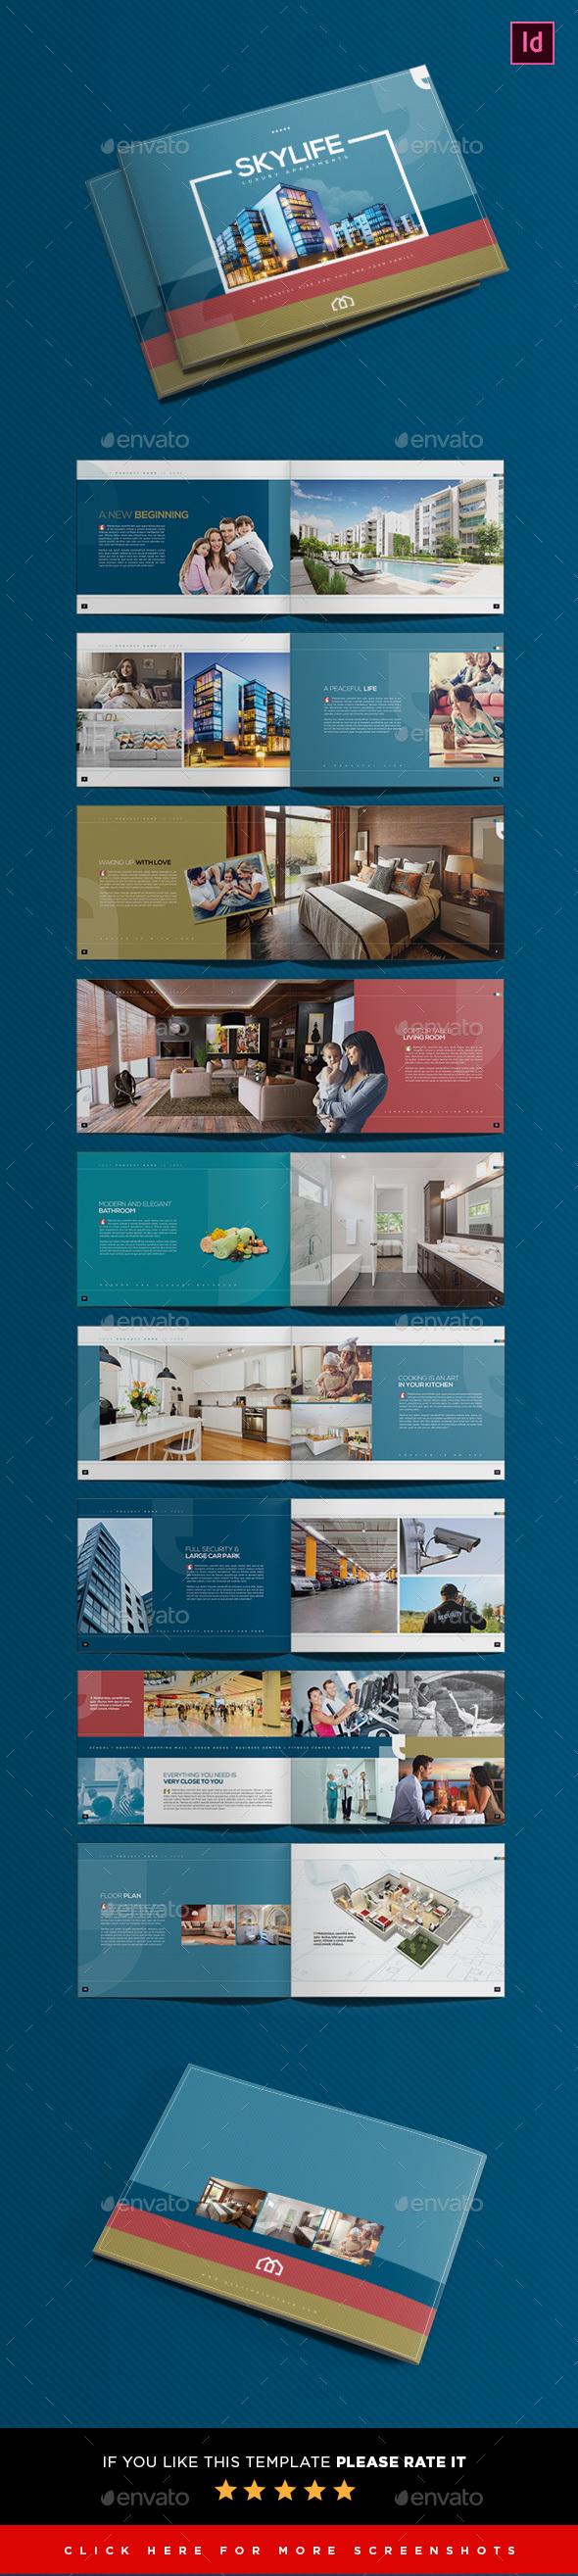 Real Estate Brochure Template - Brochures Print Templates